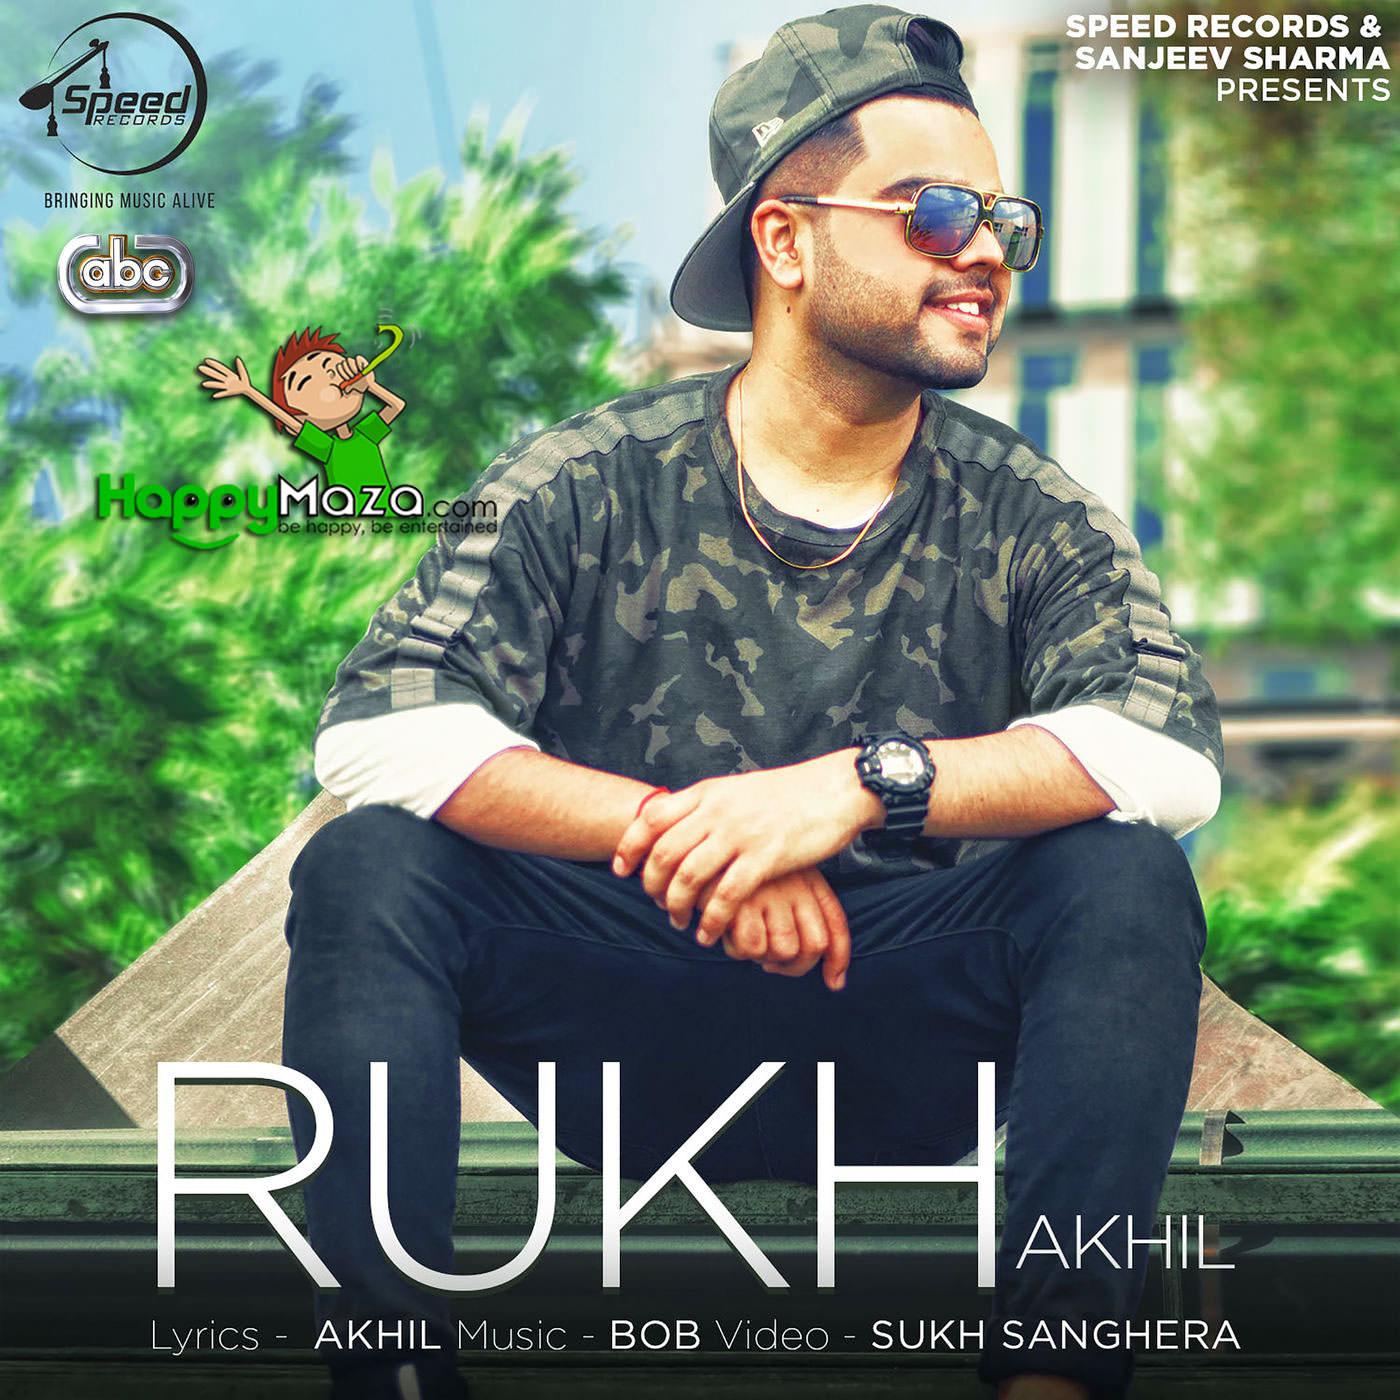 Dil Mera New Song Akhil: Rukh Lyrics - Akhil - 2017